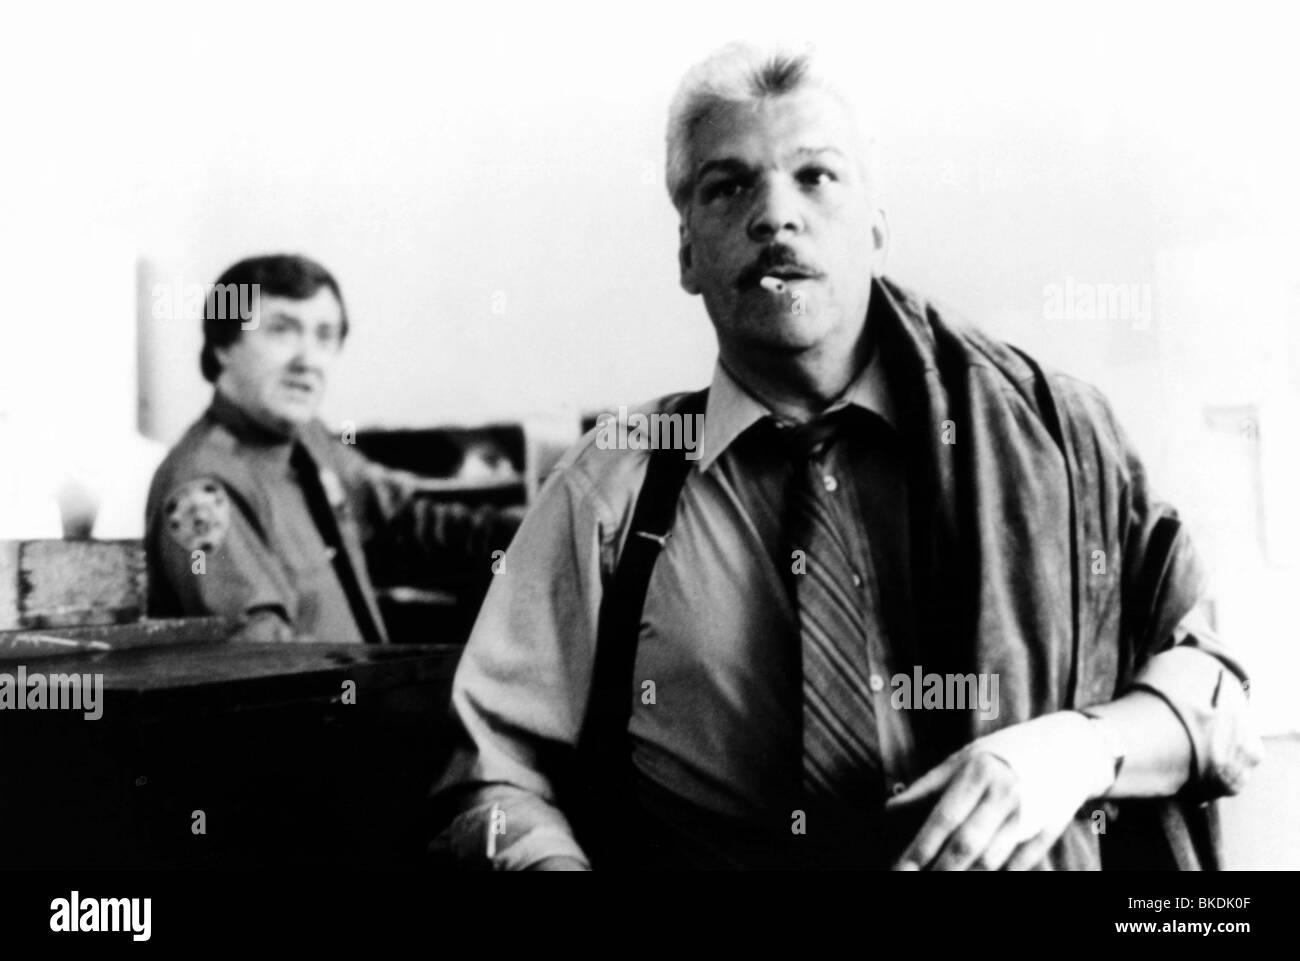 MANIAC COP -1988 TOM ATKINS - Stock Image